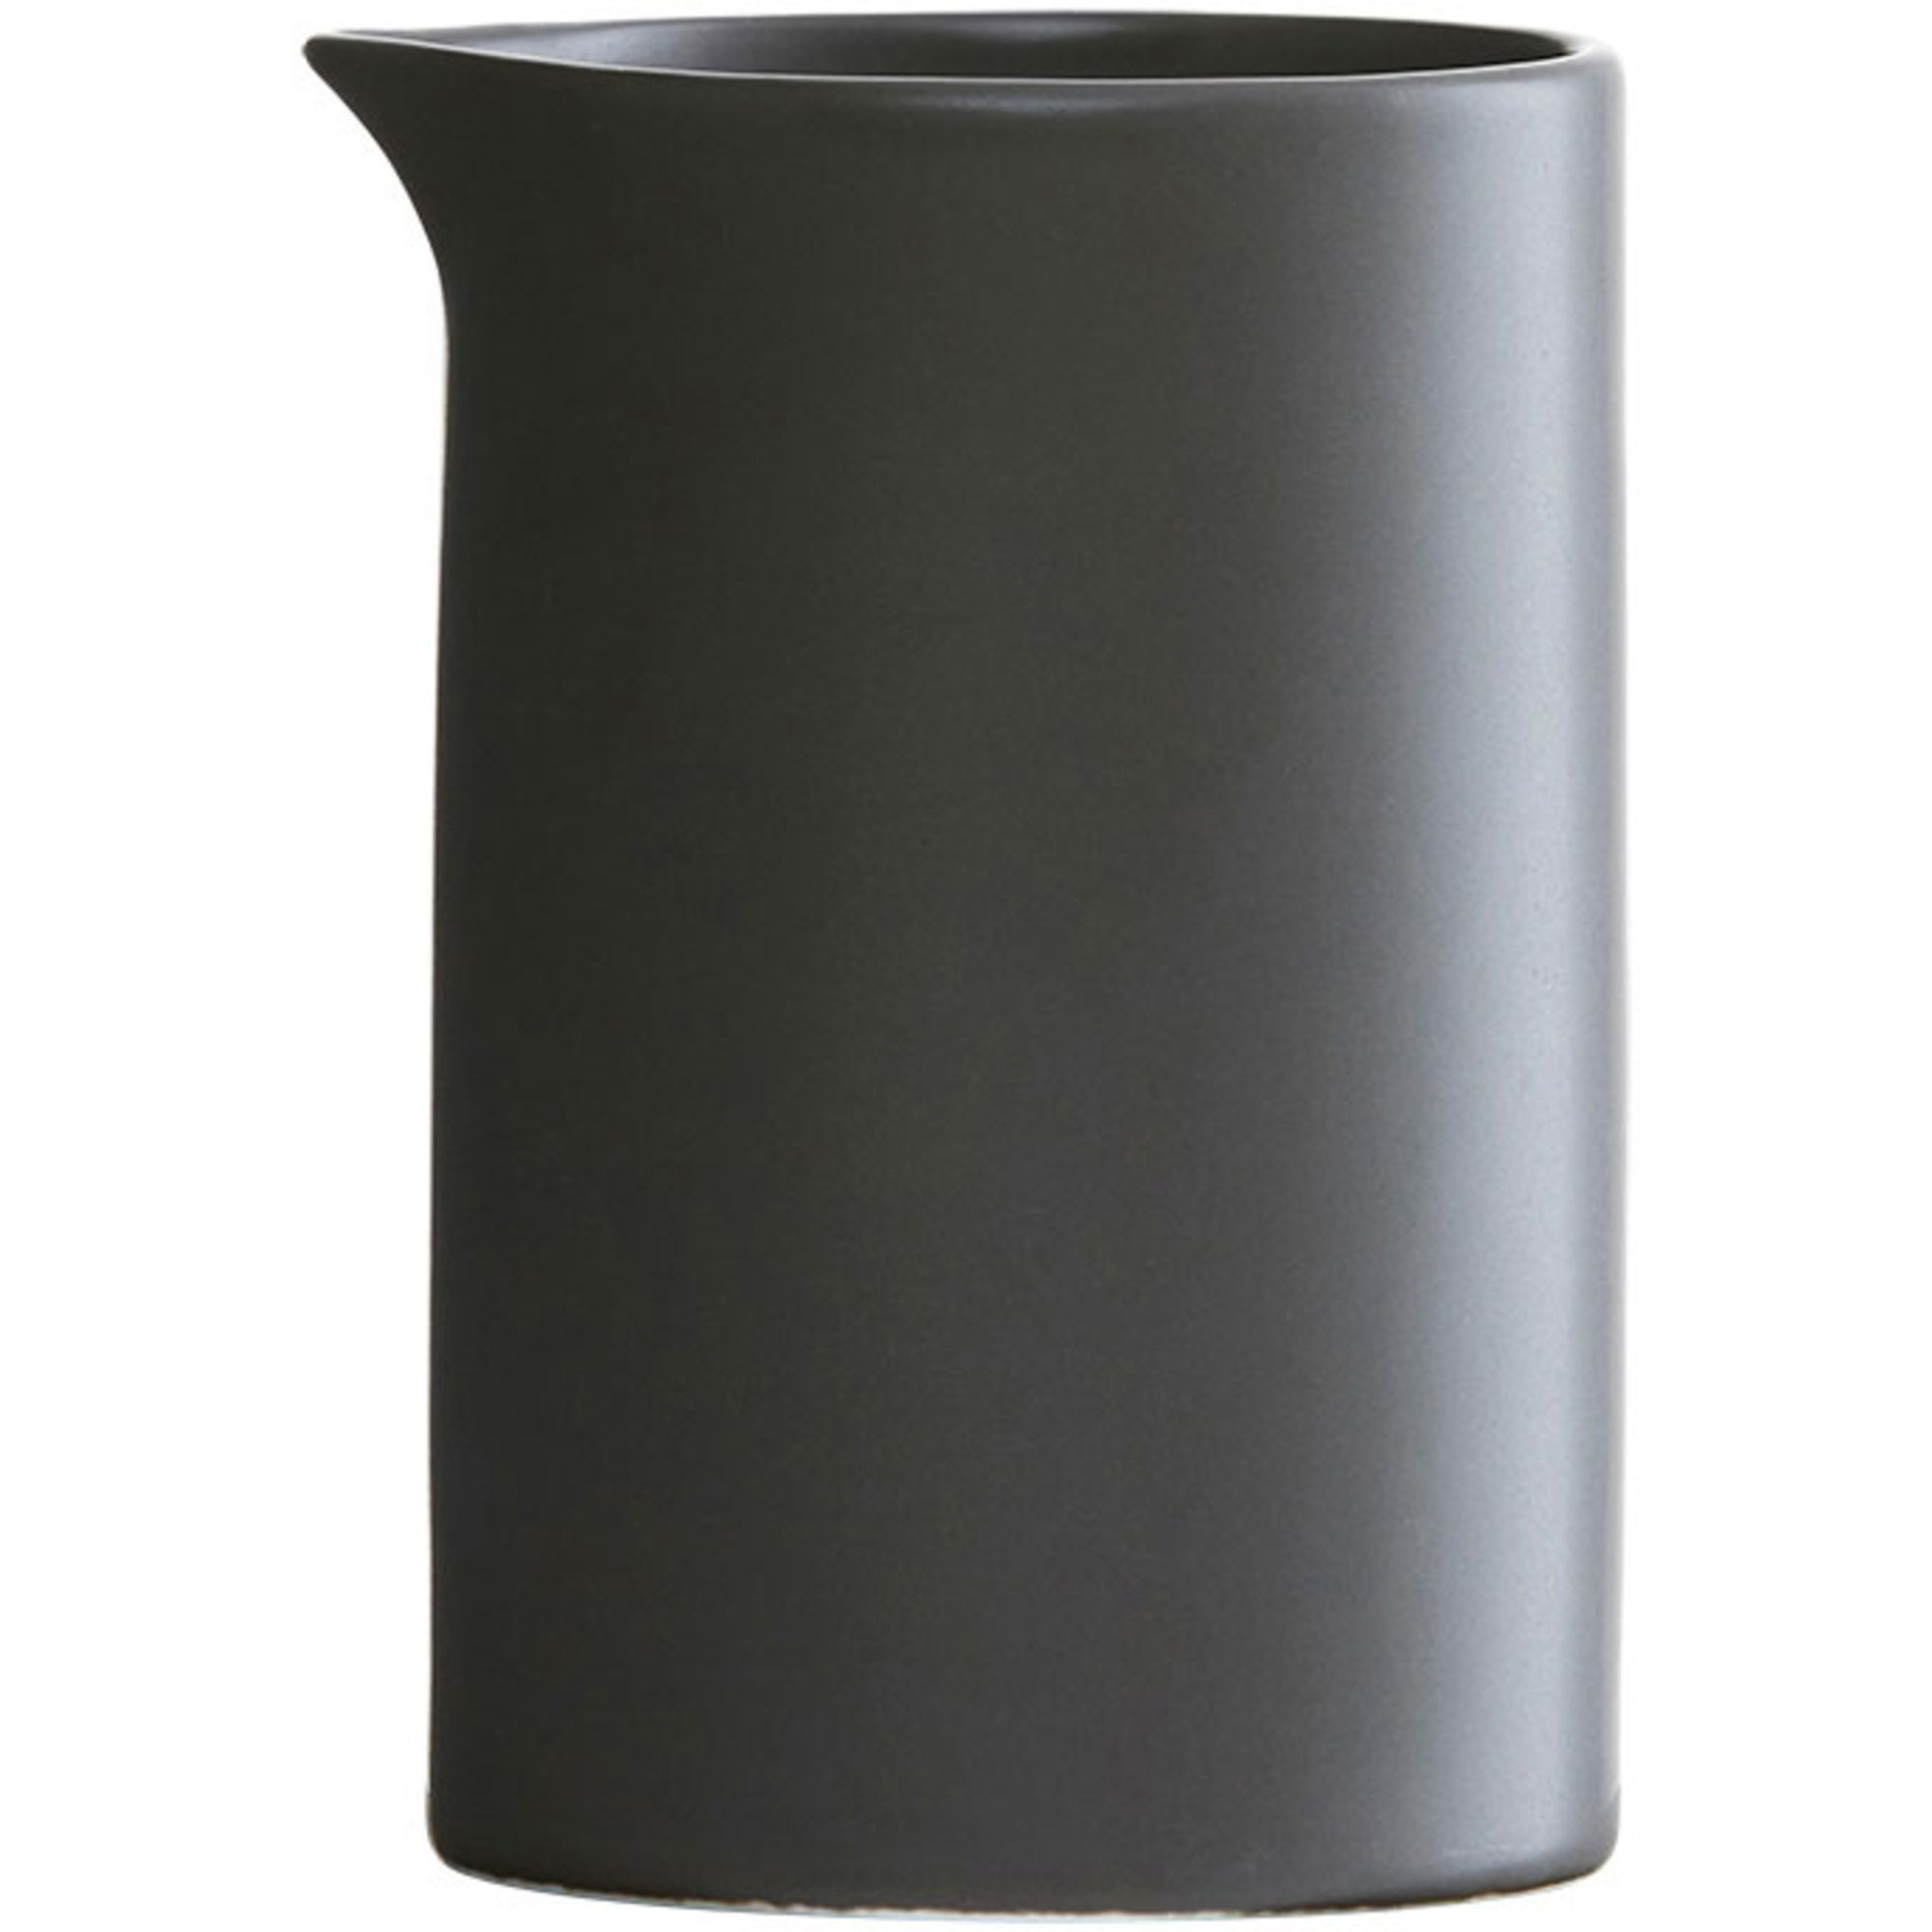 House Doctor Kanna Pot Black